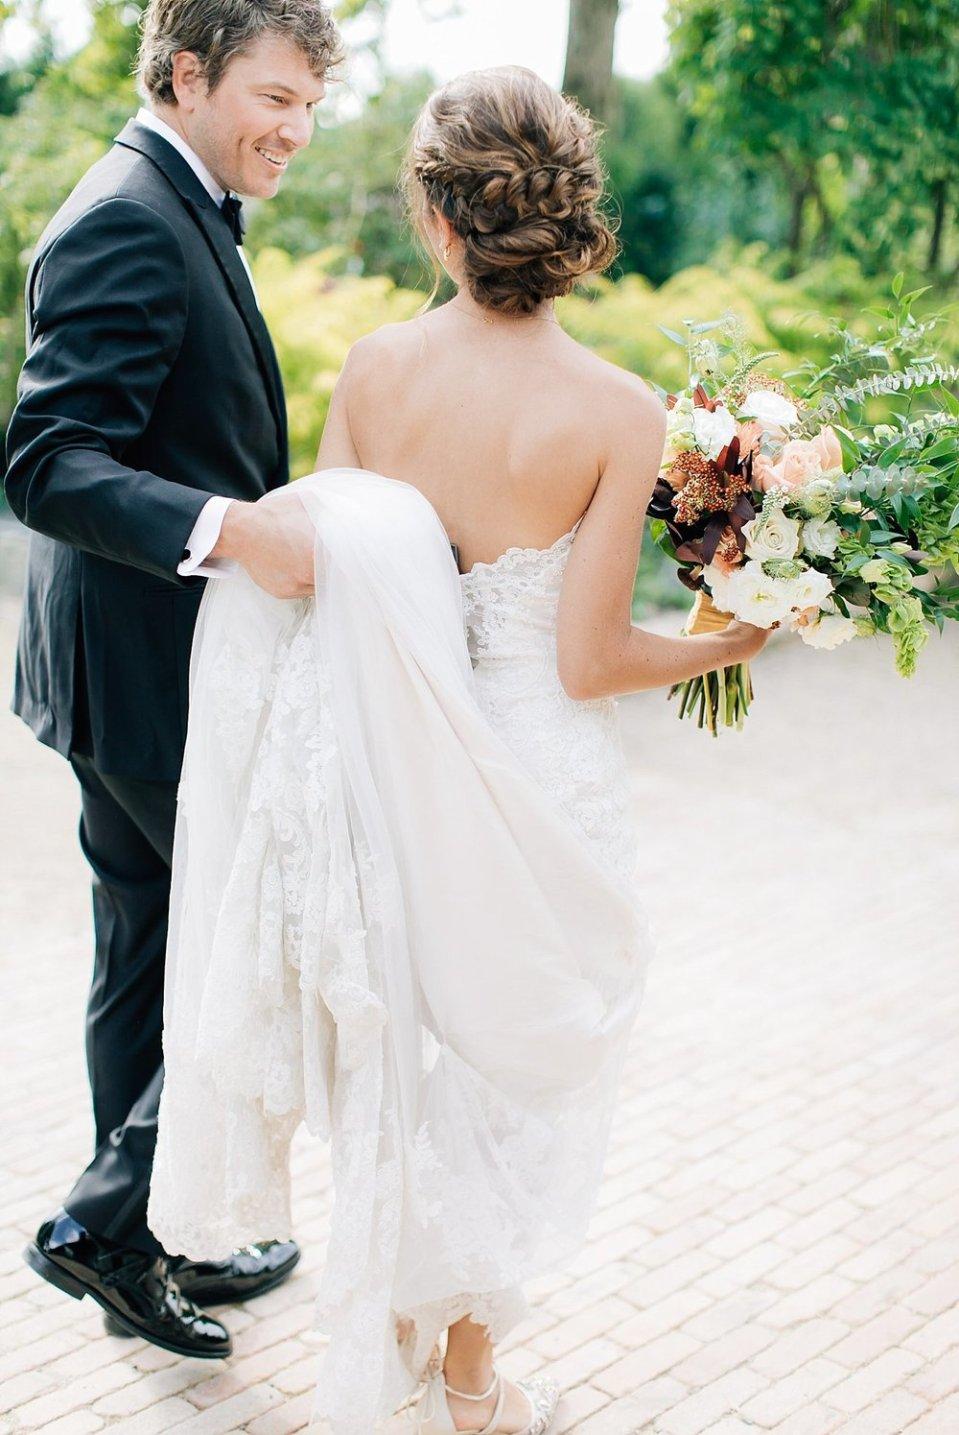 terrain gatherings glen mills pa romantic garden wedding photography magdalena studios 0030